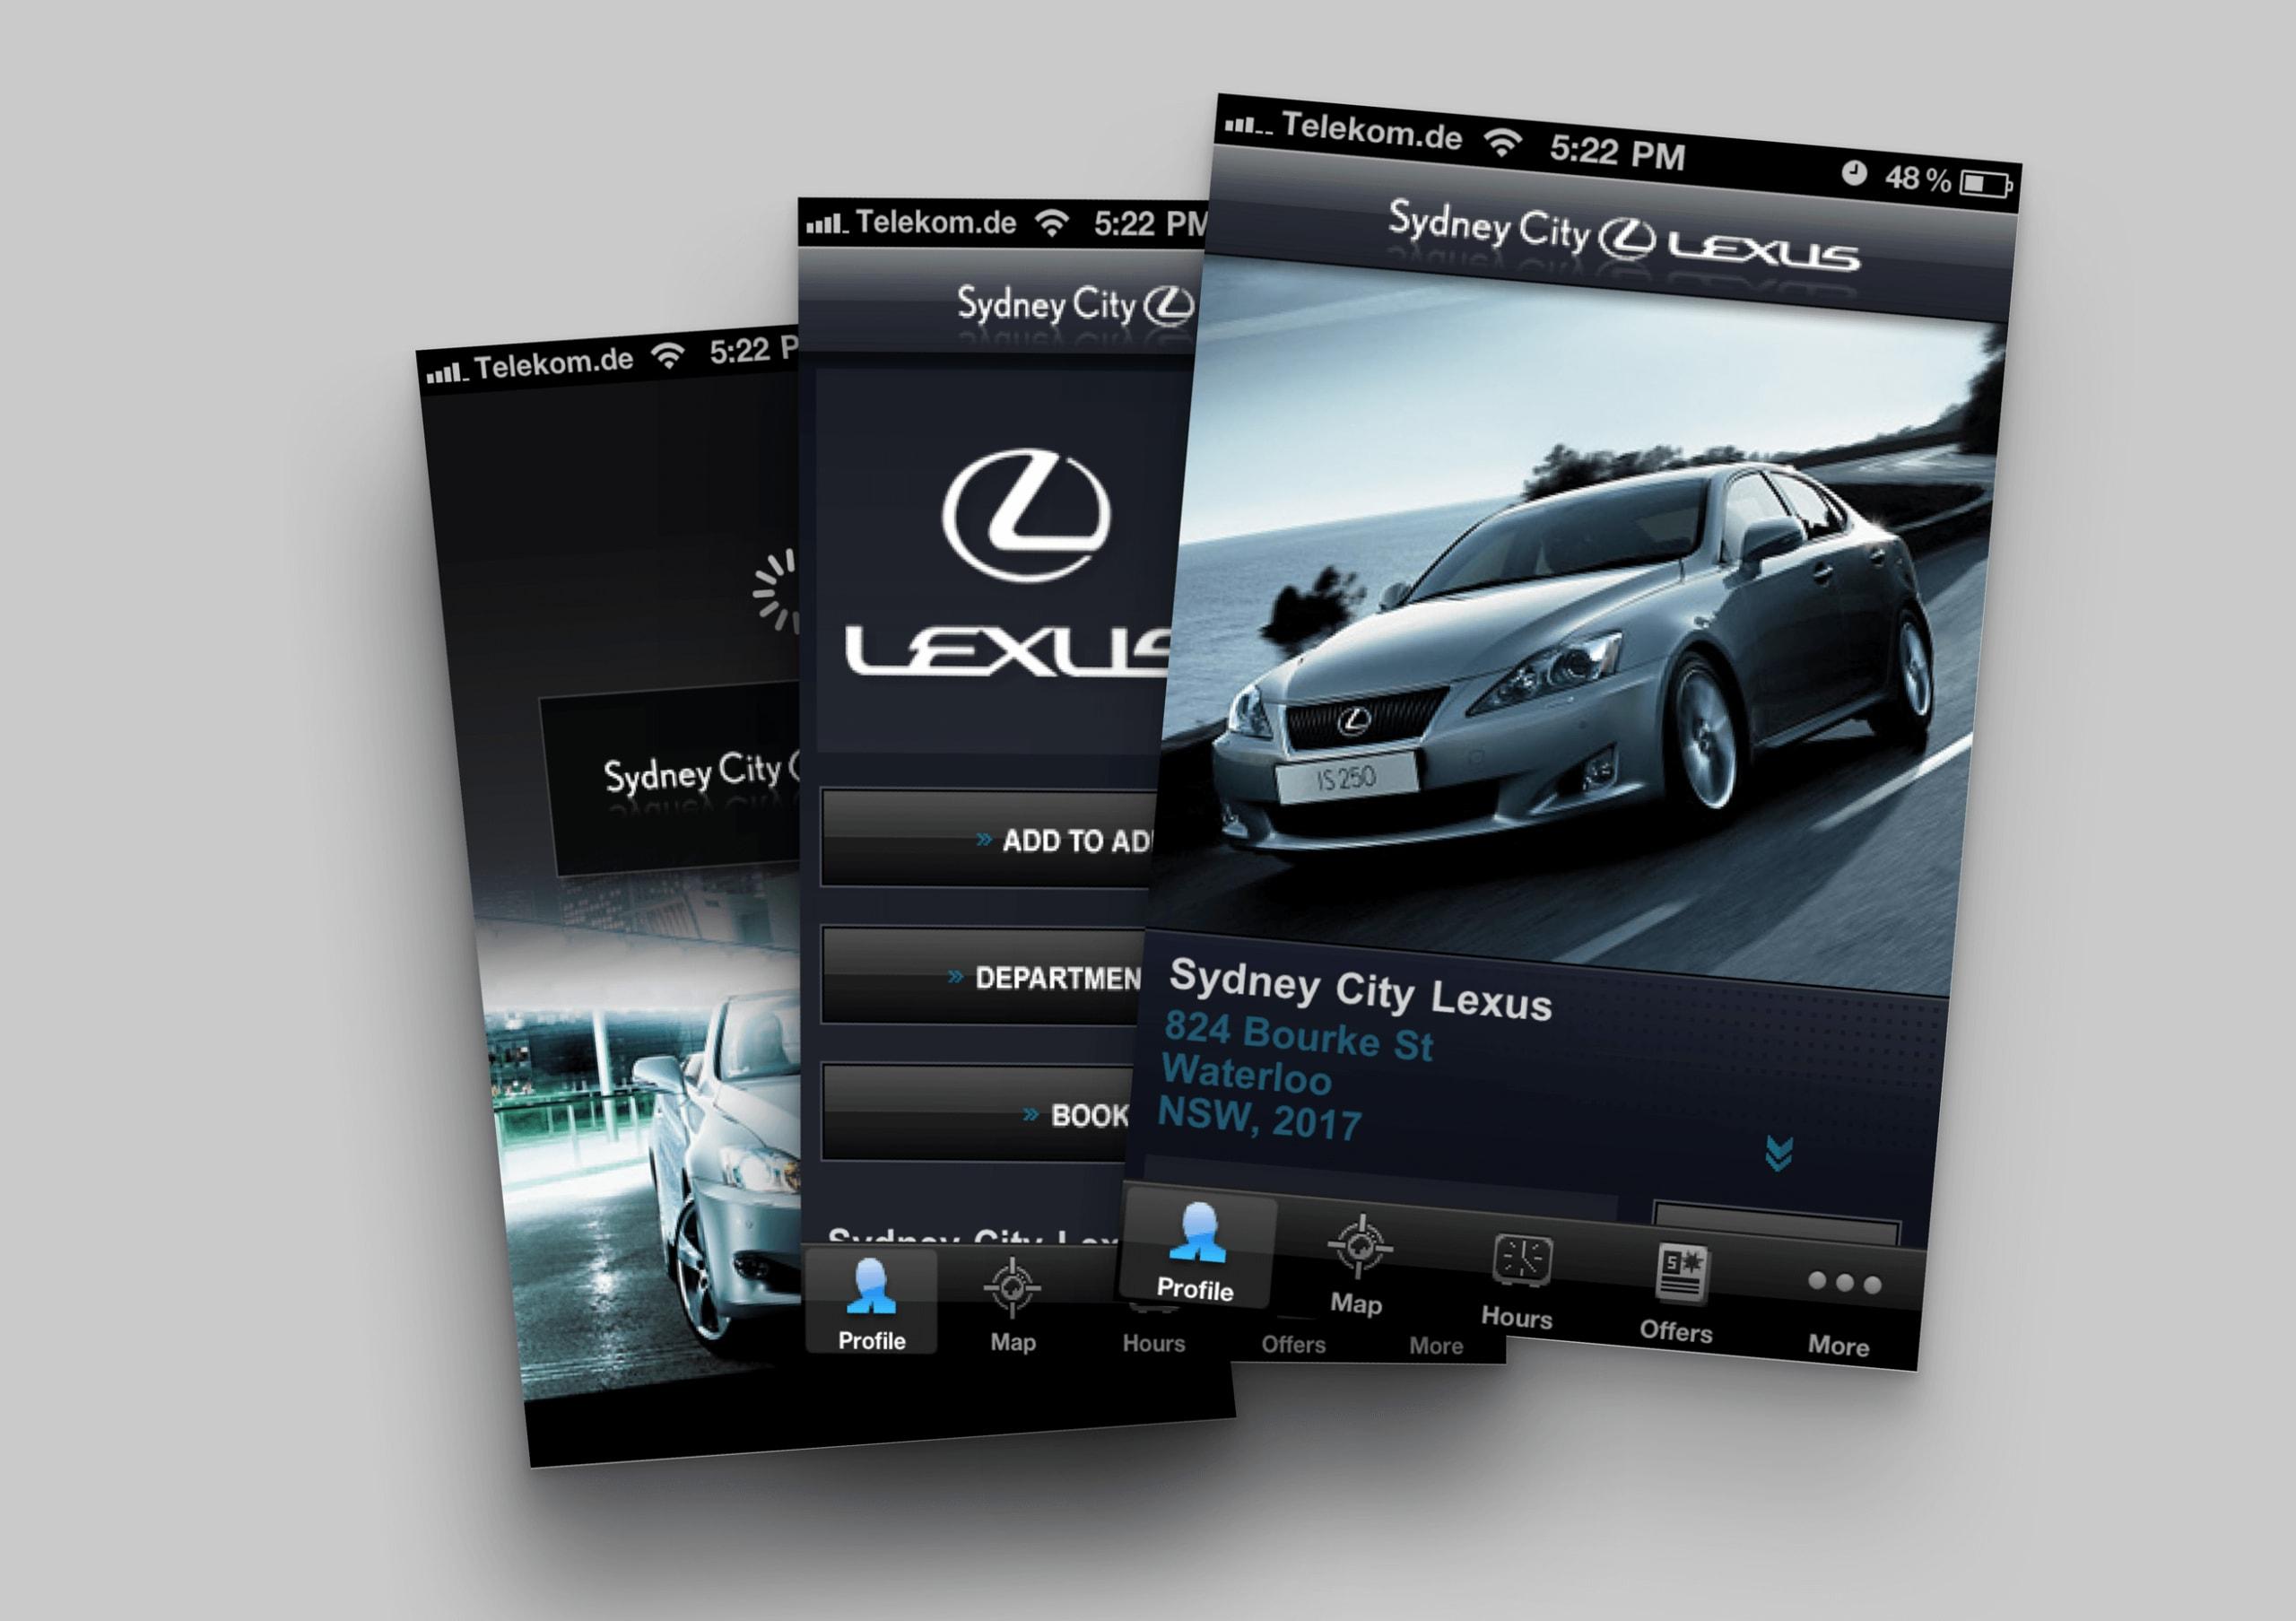 Lexus-Dealership-App-1@3x-mobile